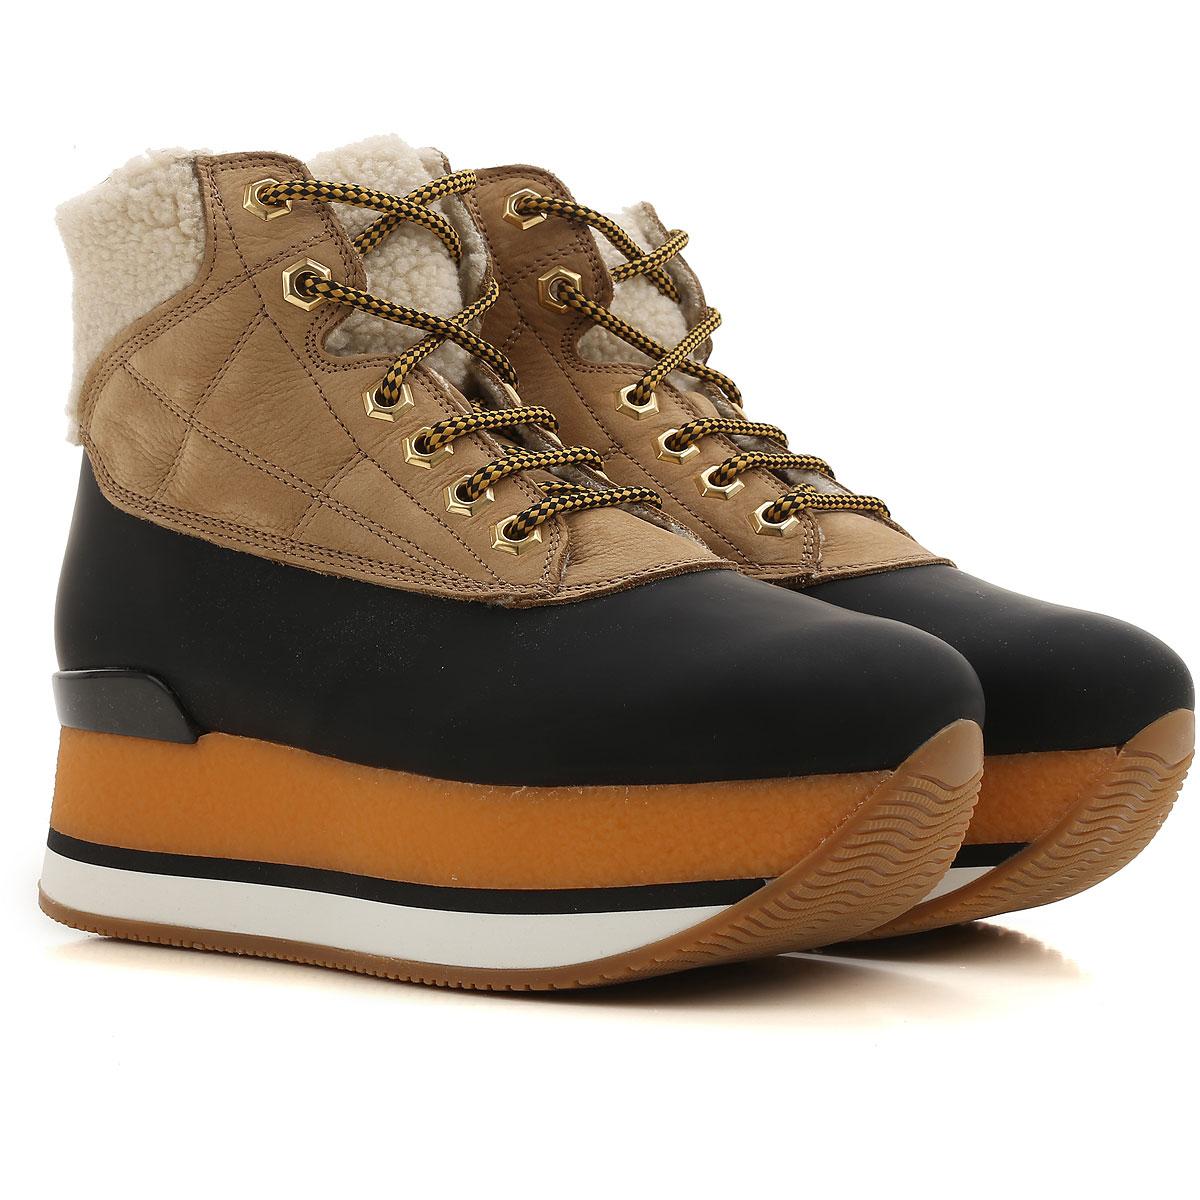 chaussures femme hogan code produit hxw3280j320htd0xfk. Black Bedroom Furniture Sets. Home Design Ideas